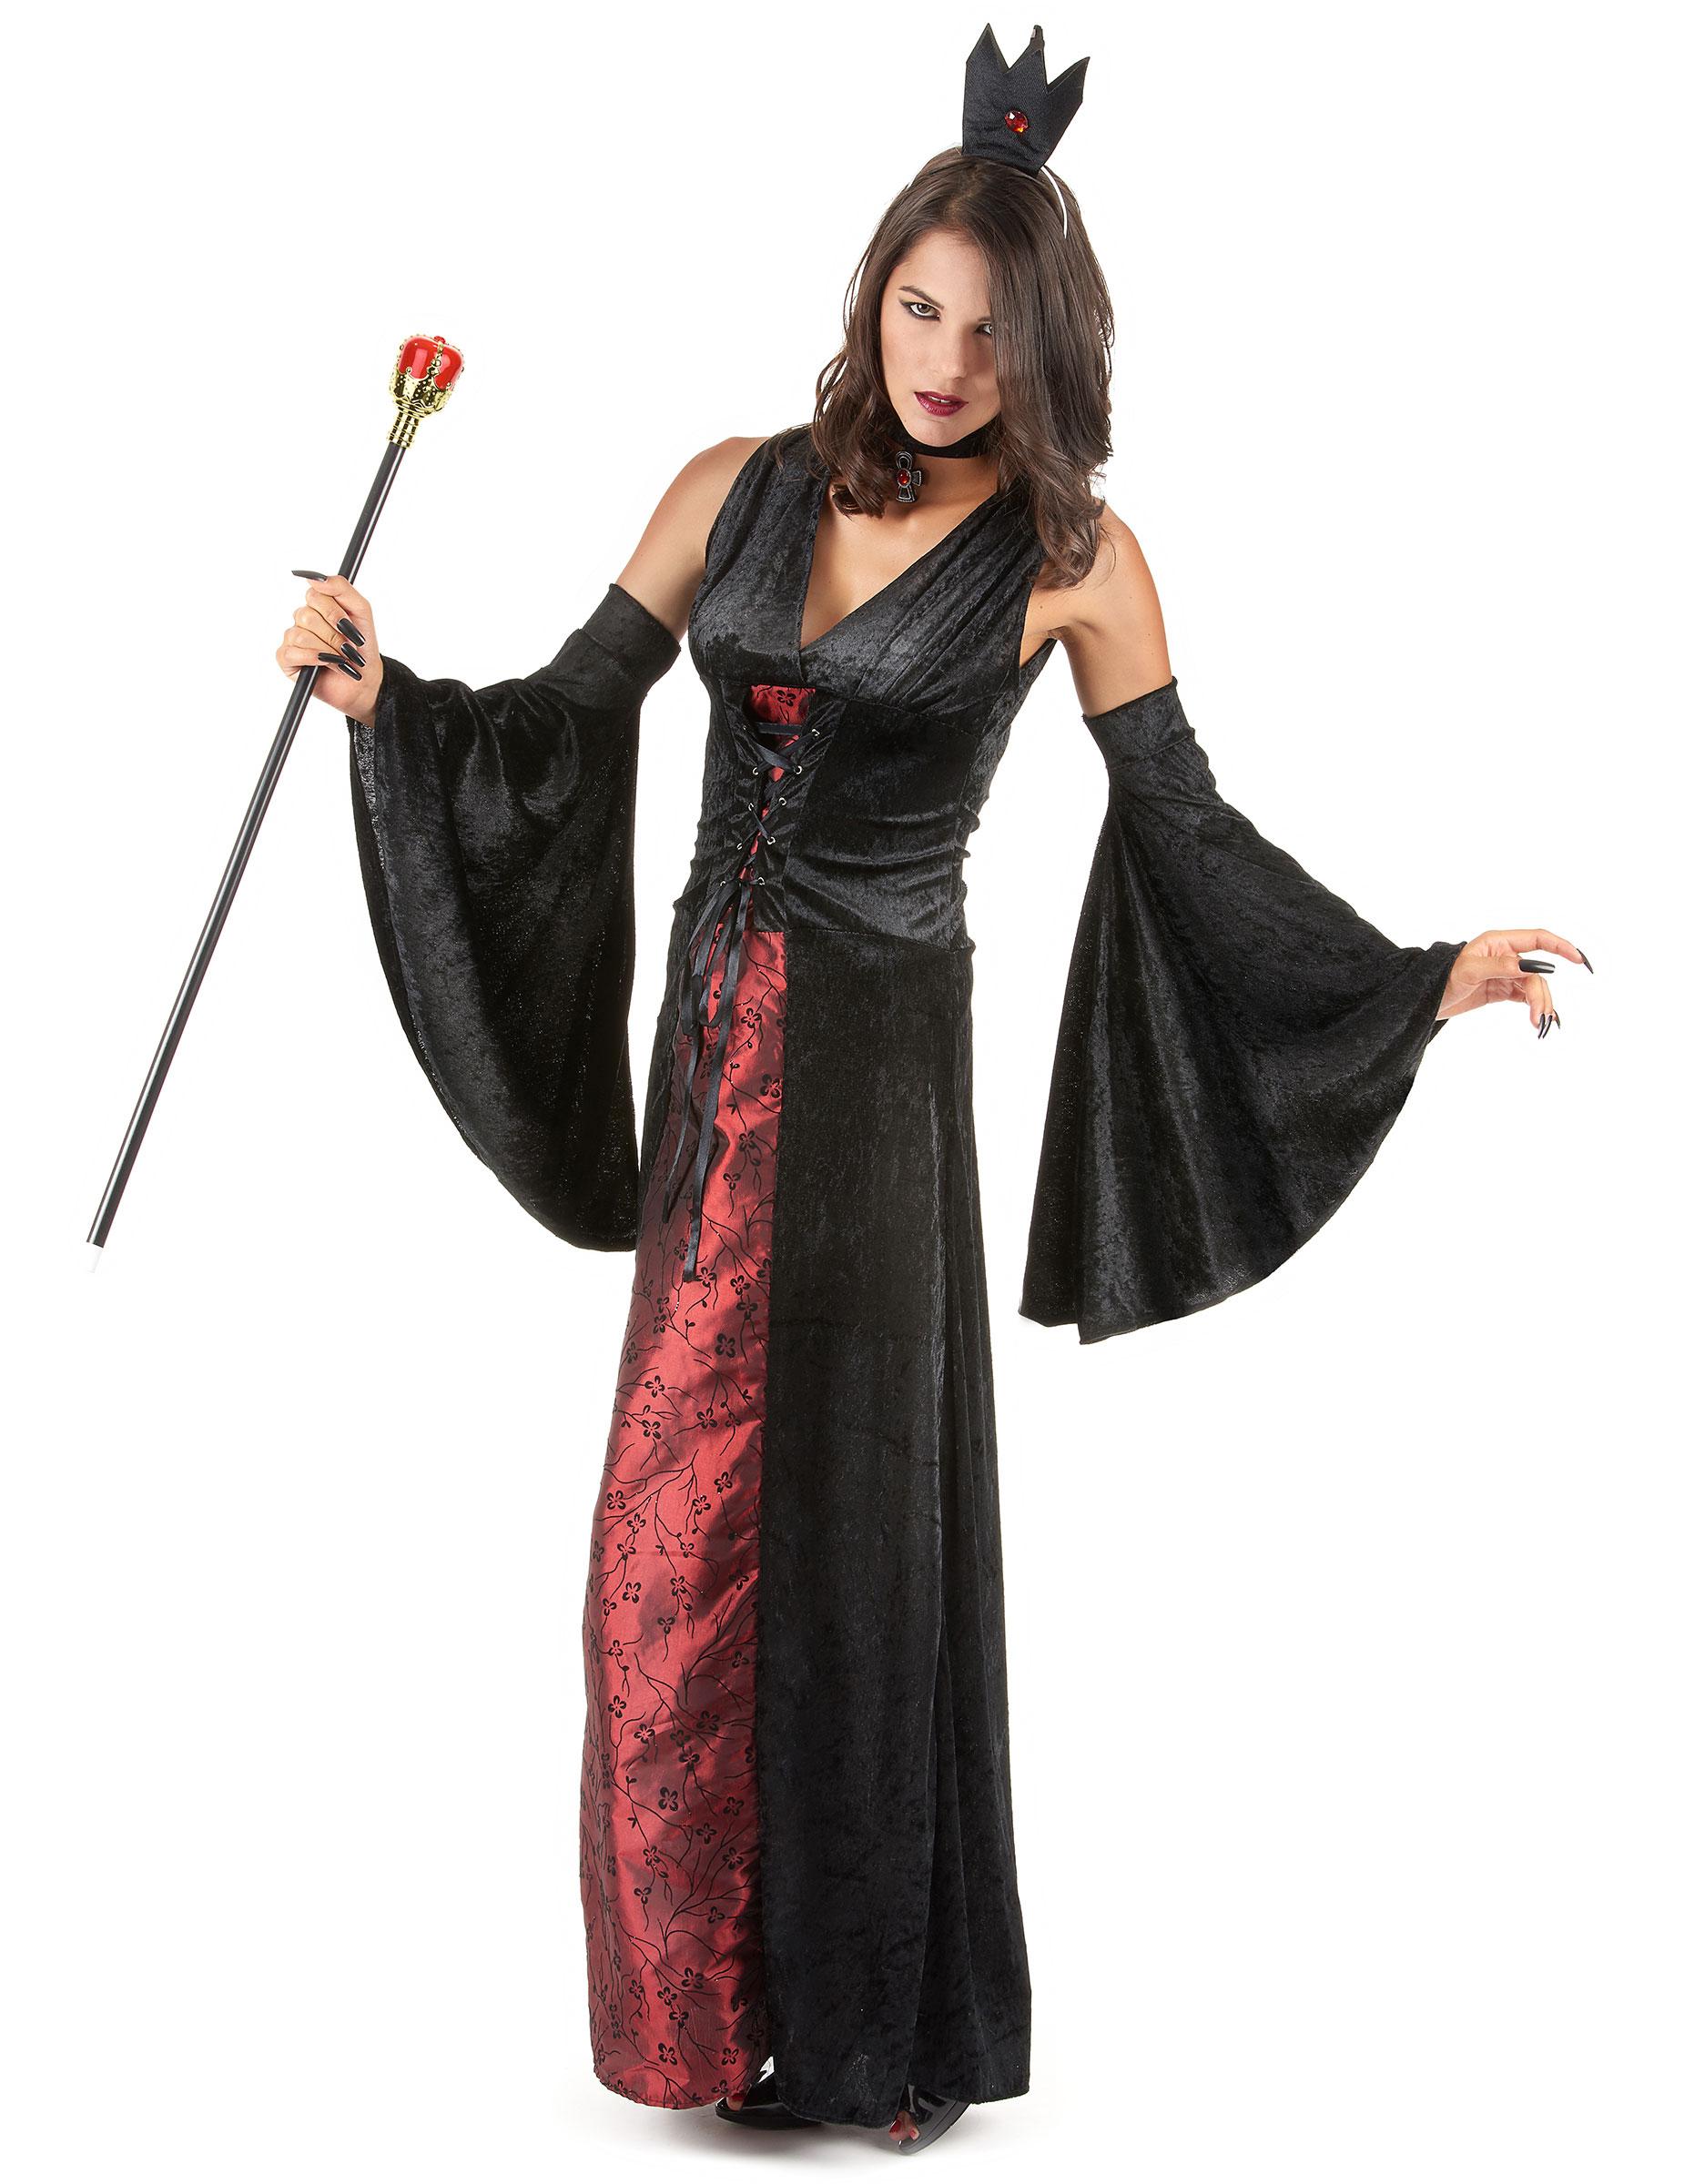 Costume per donna vampira su VegaooParty 93ac83886633